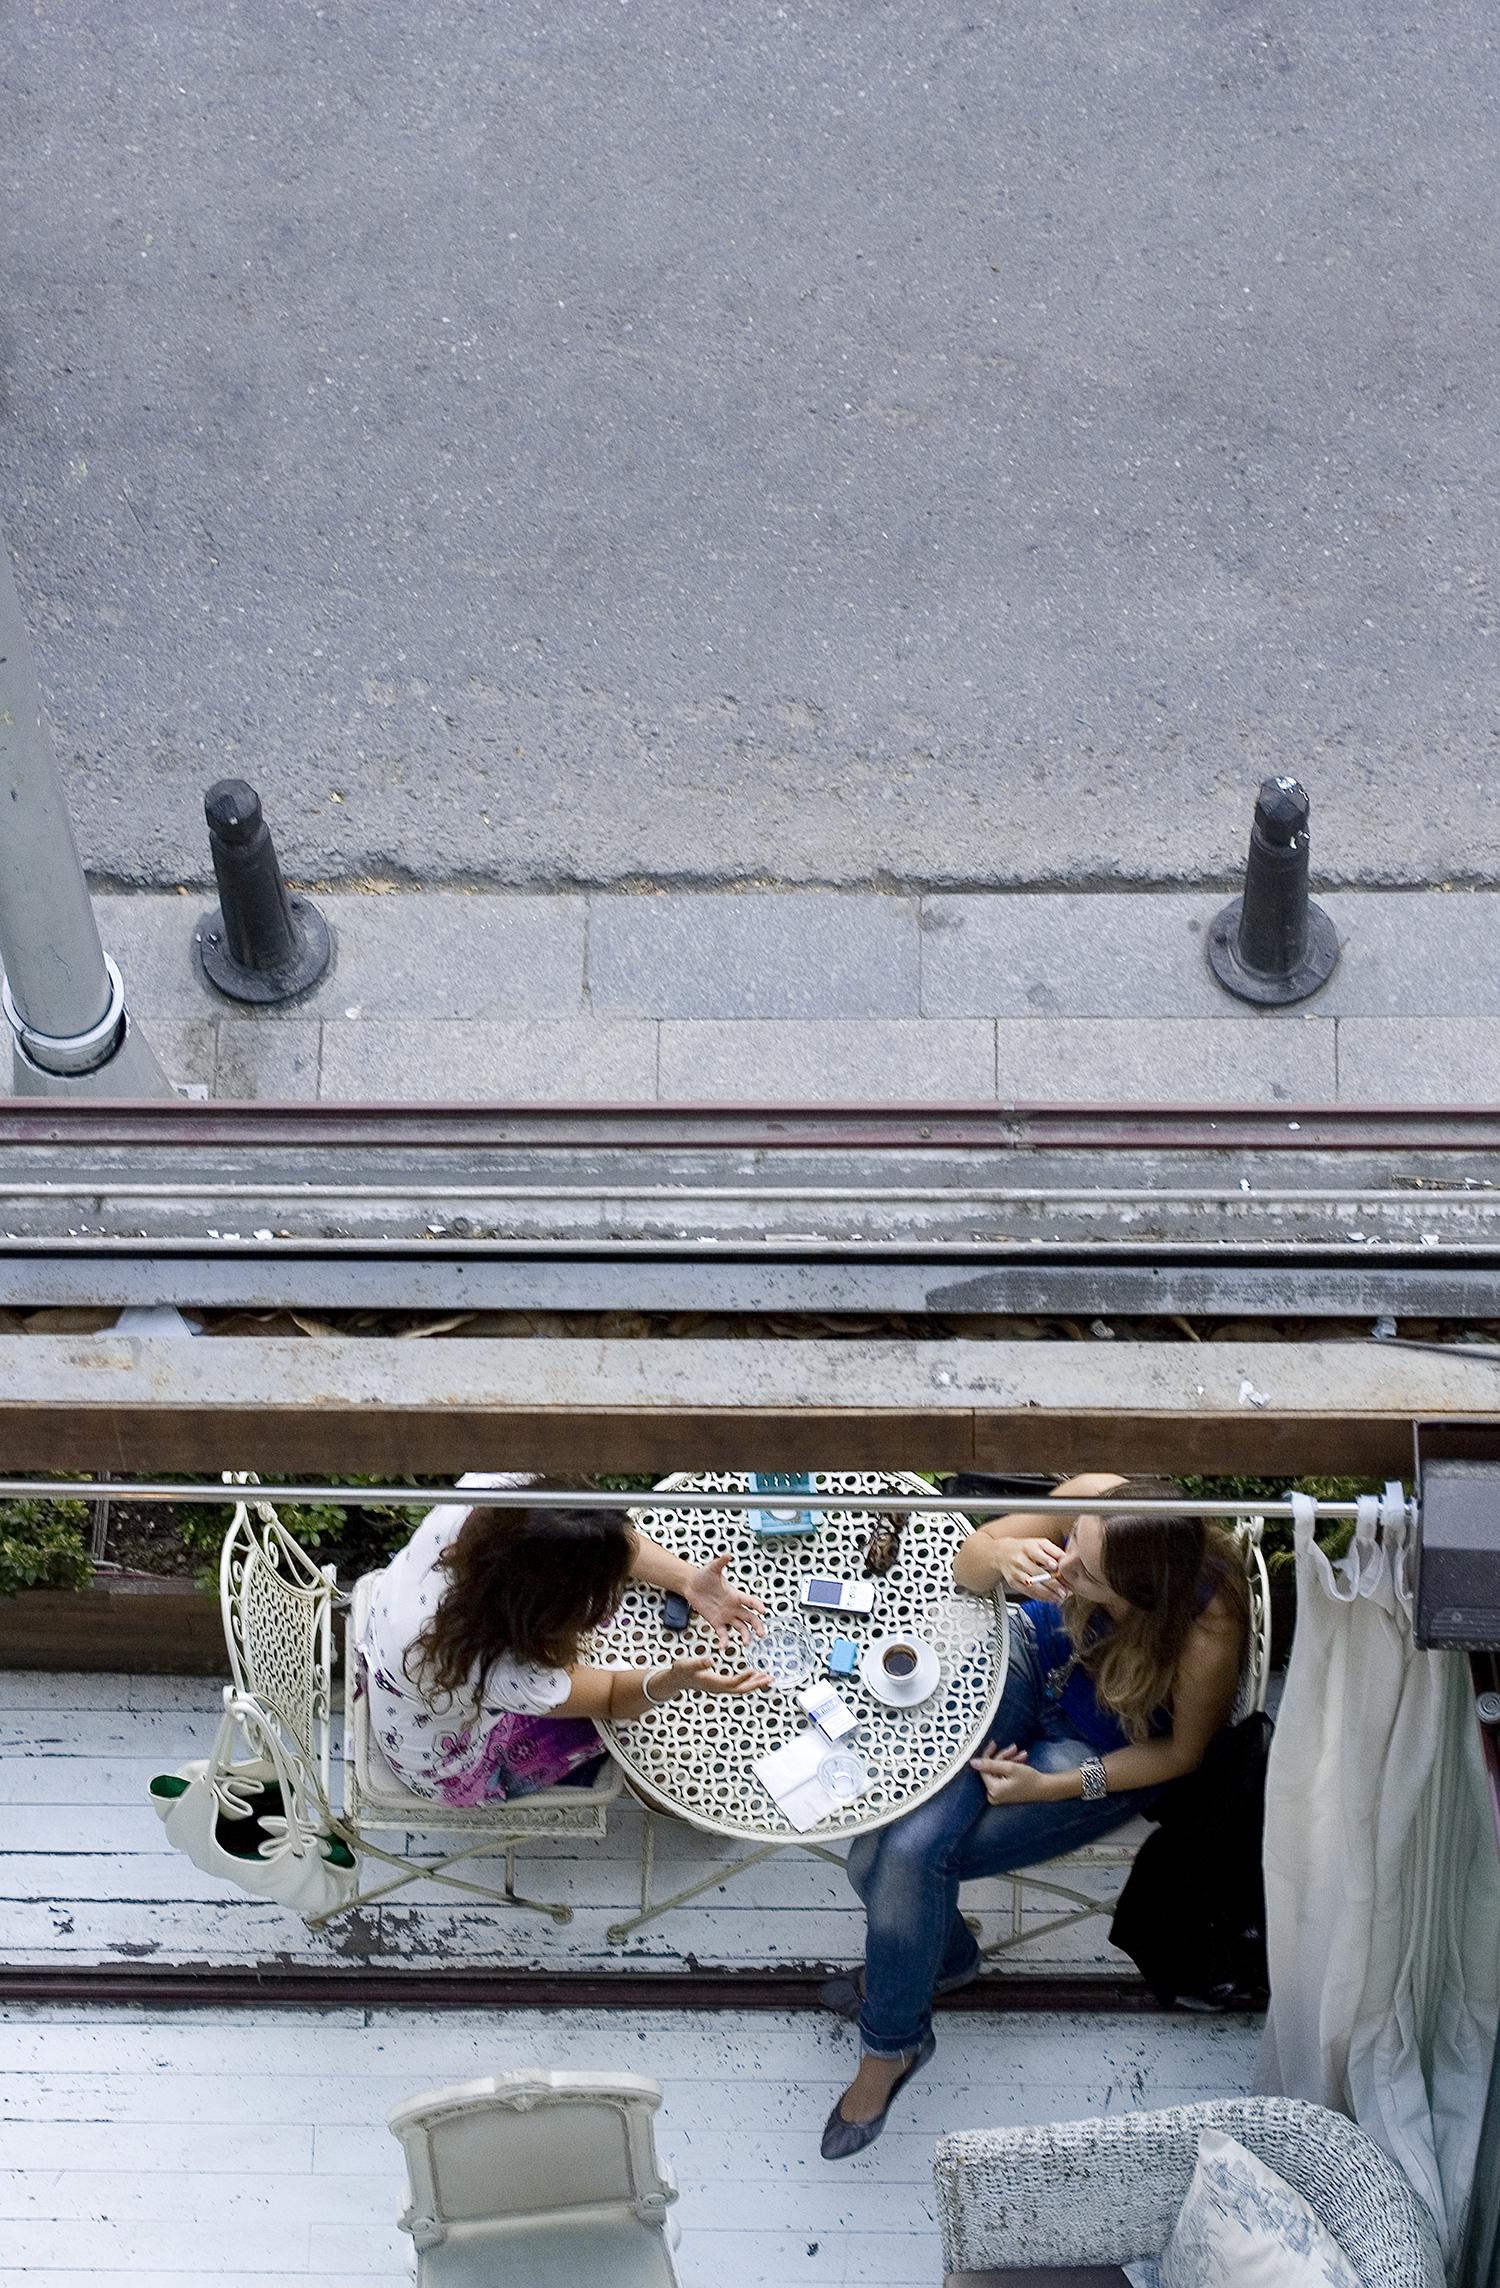 lifestyle-editorial-travel-washington-dc-malek-naz-photography-bebek-istanbul.jpg